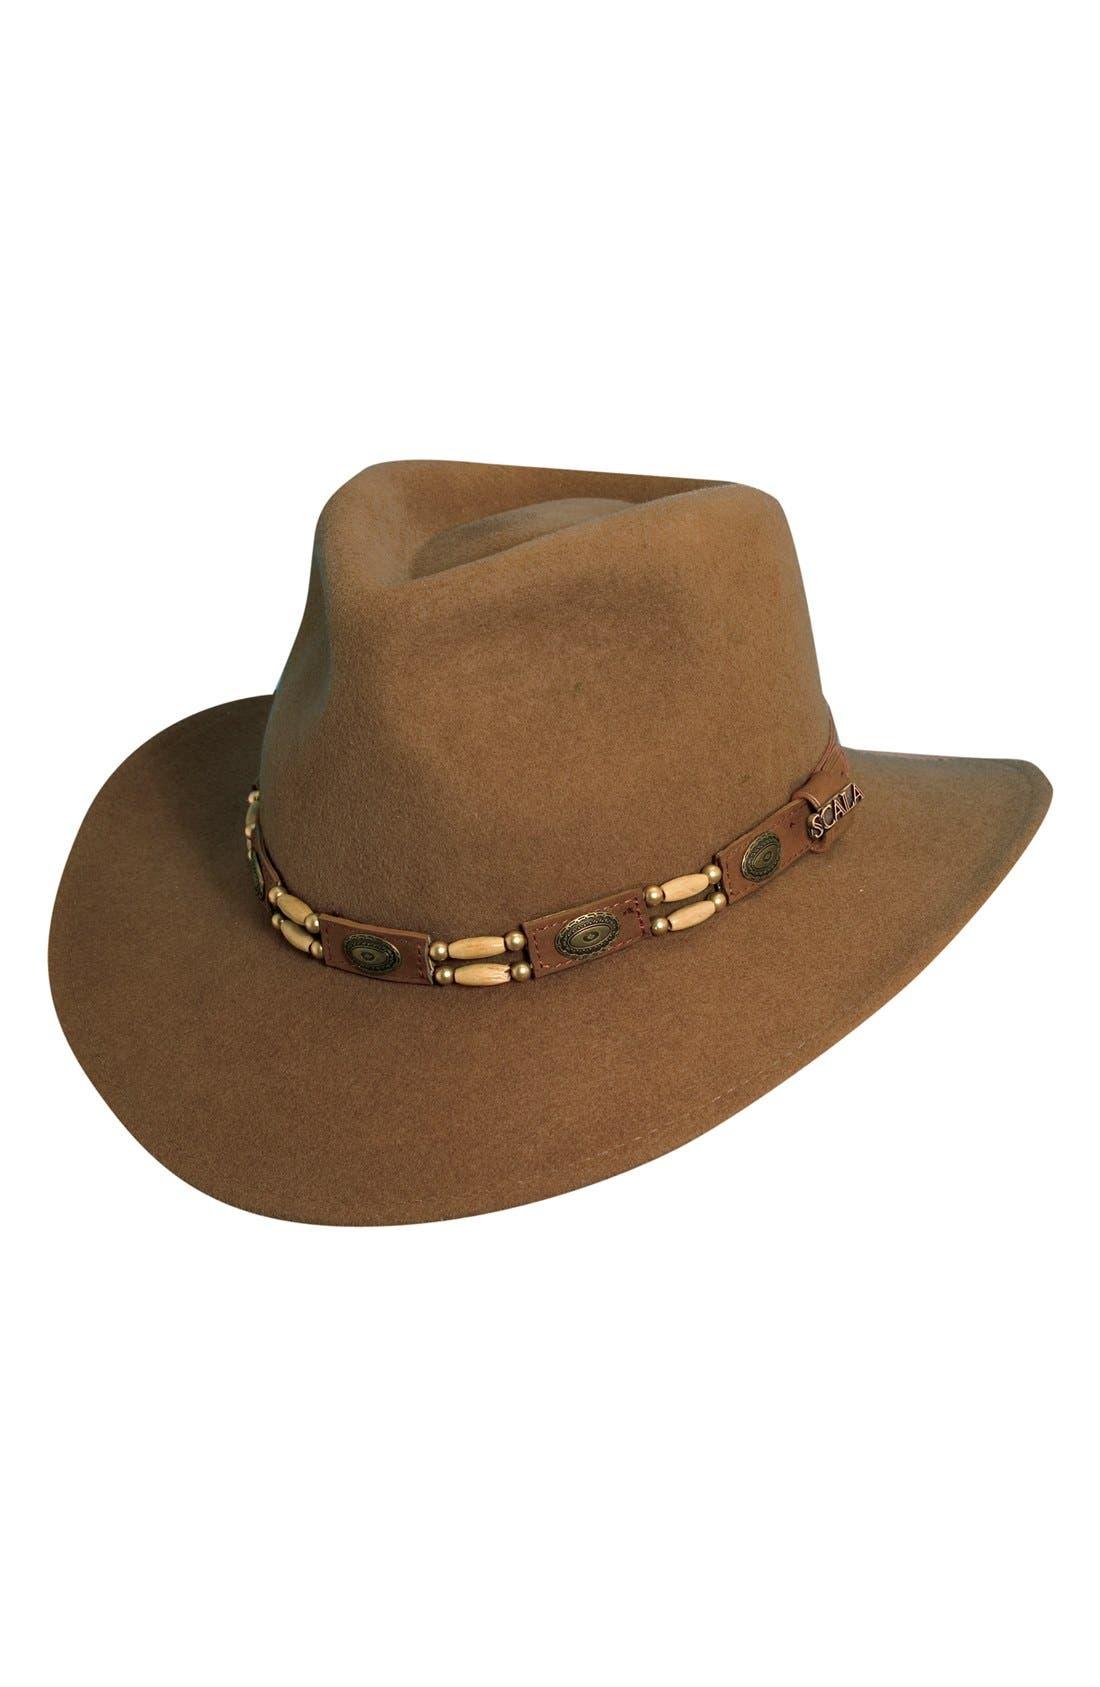 SCALA, Crushable Wool Felt Outback Hat, Main thumbnail 1, color, PECAN